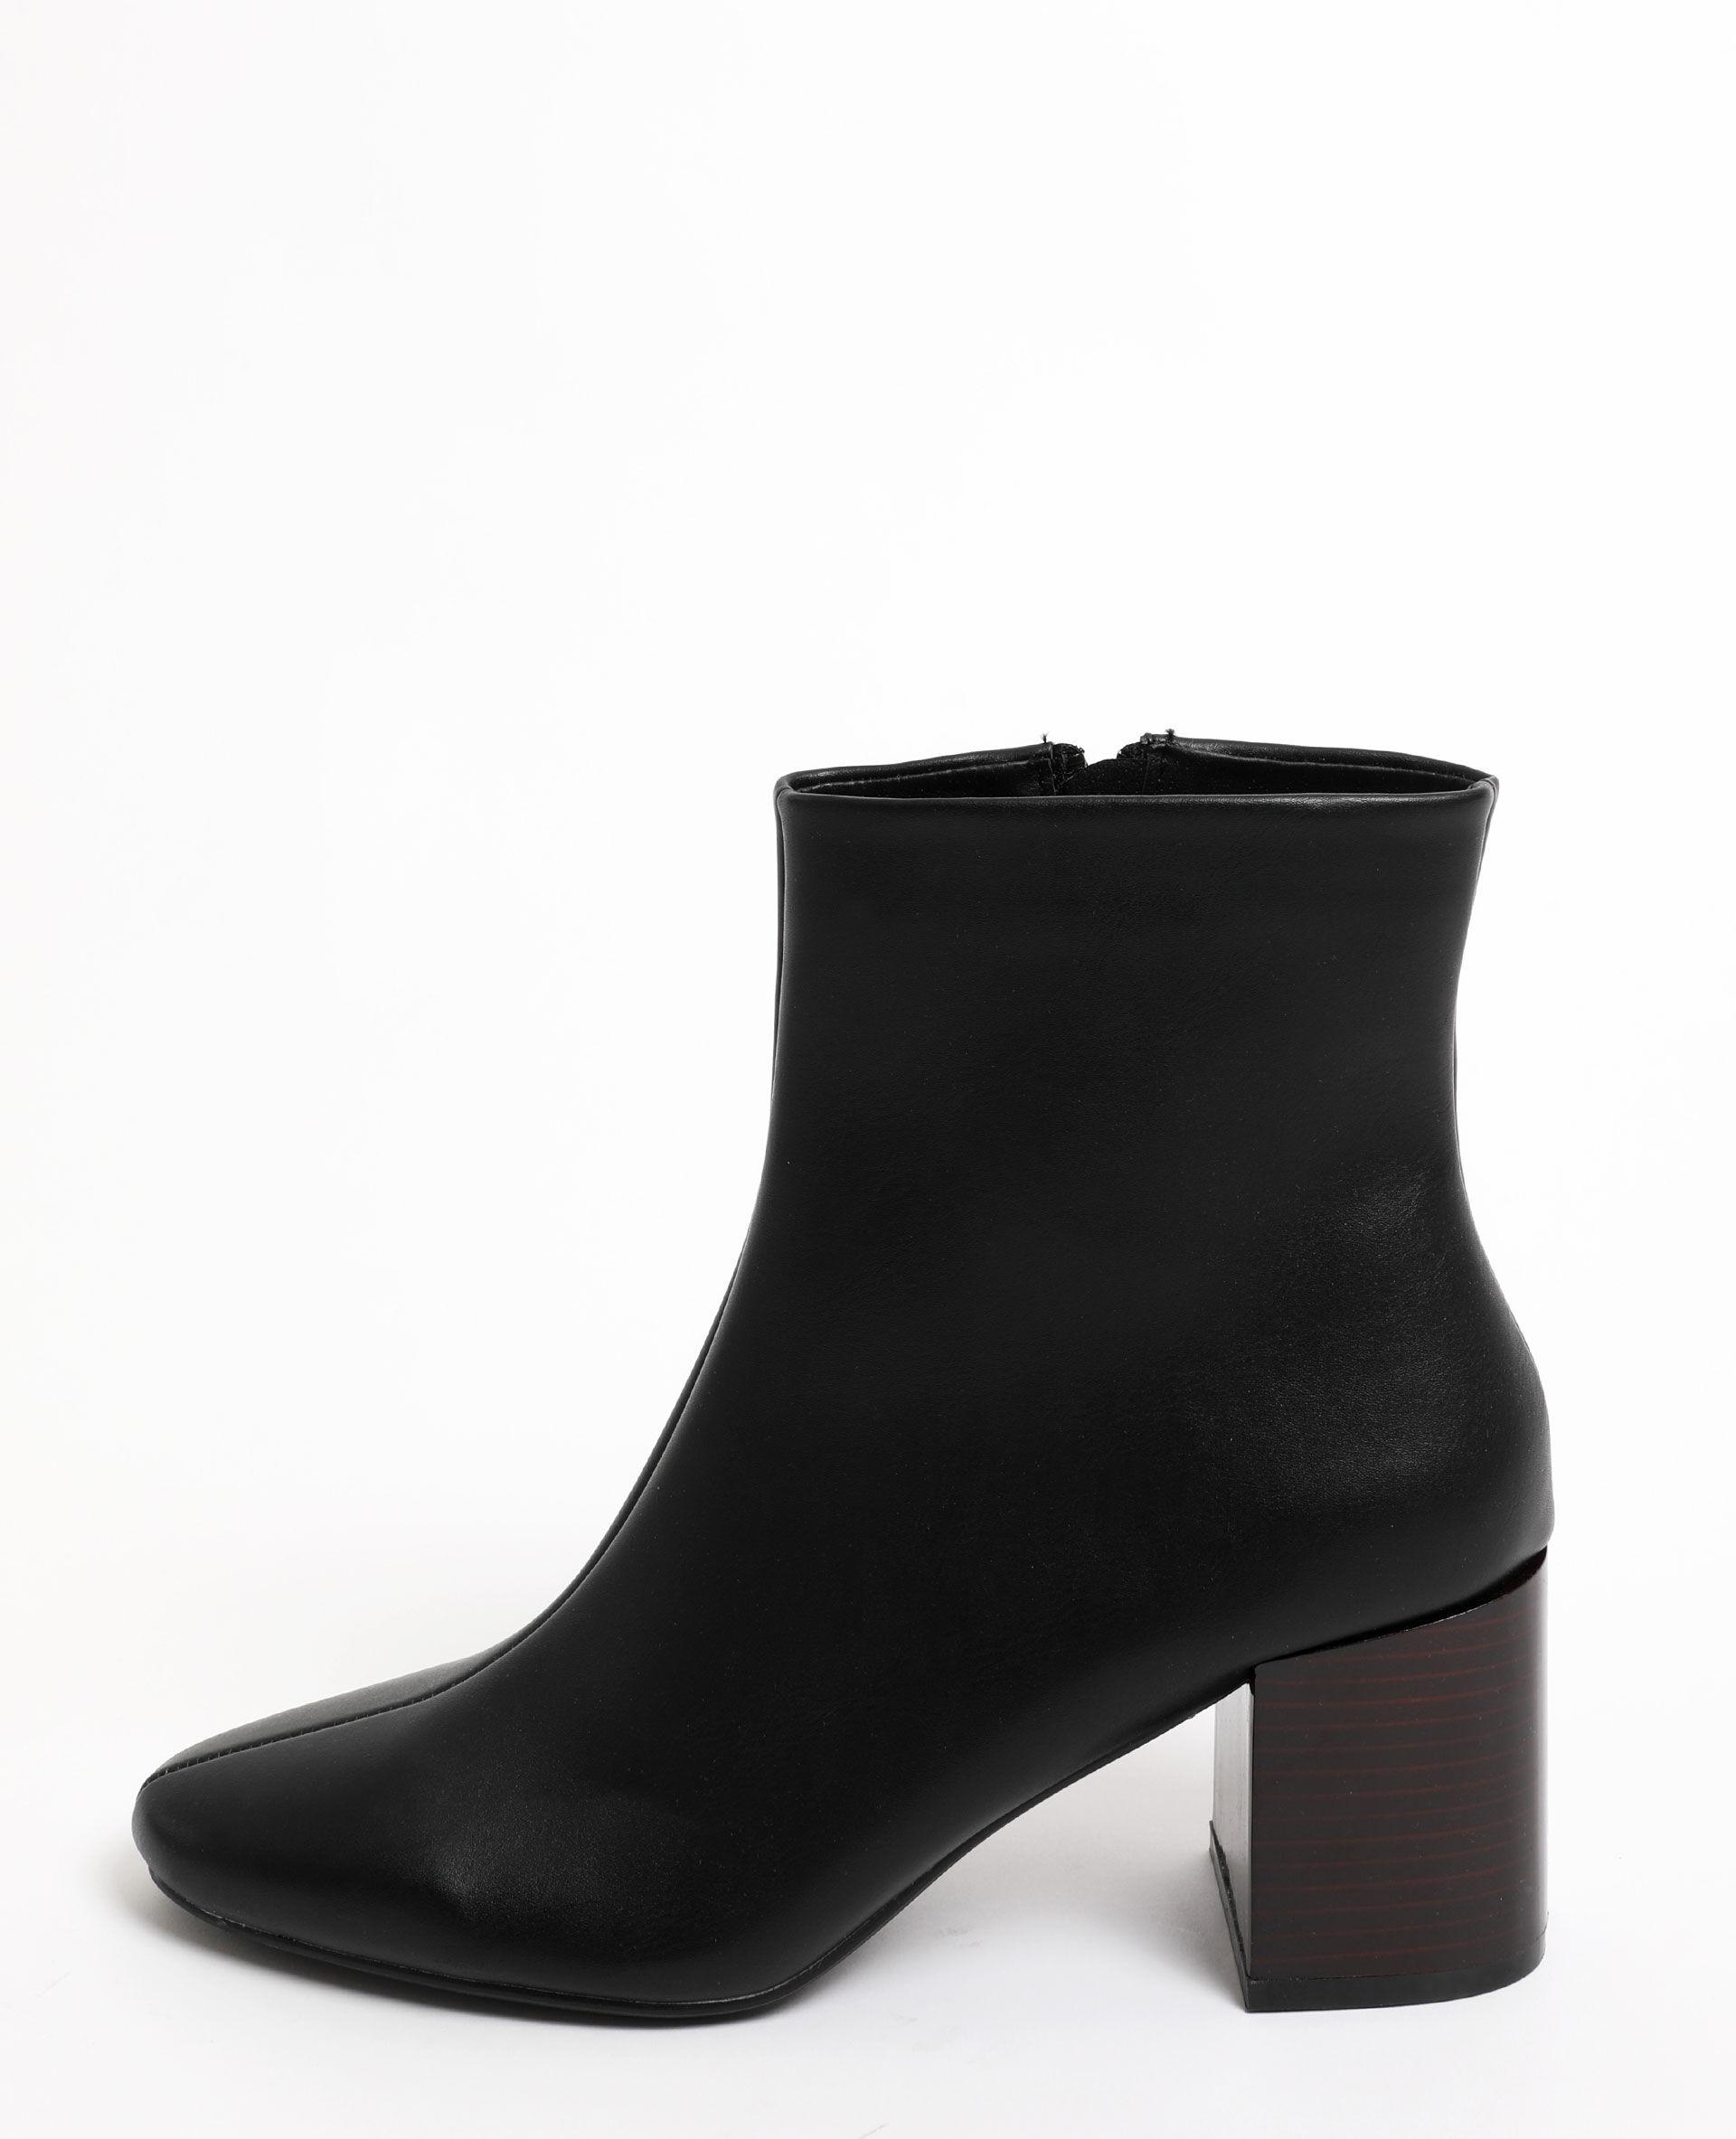 Boots femme | Pimkie